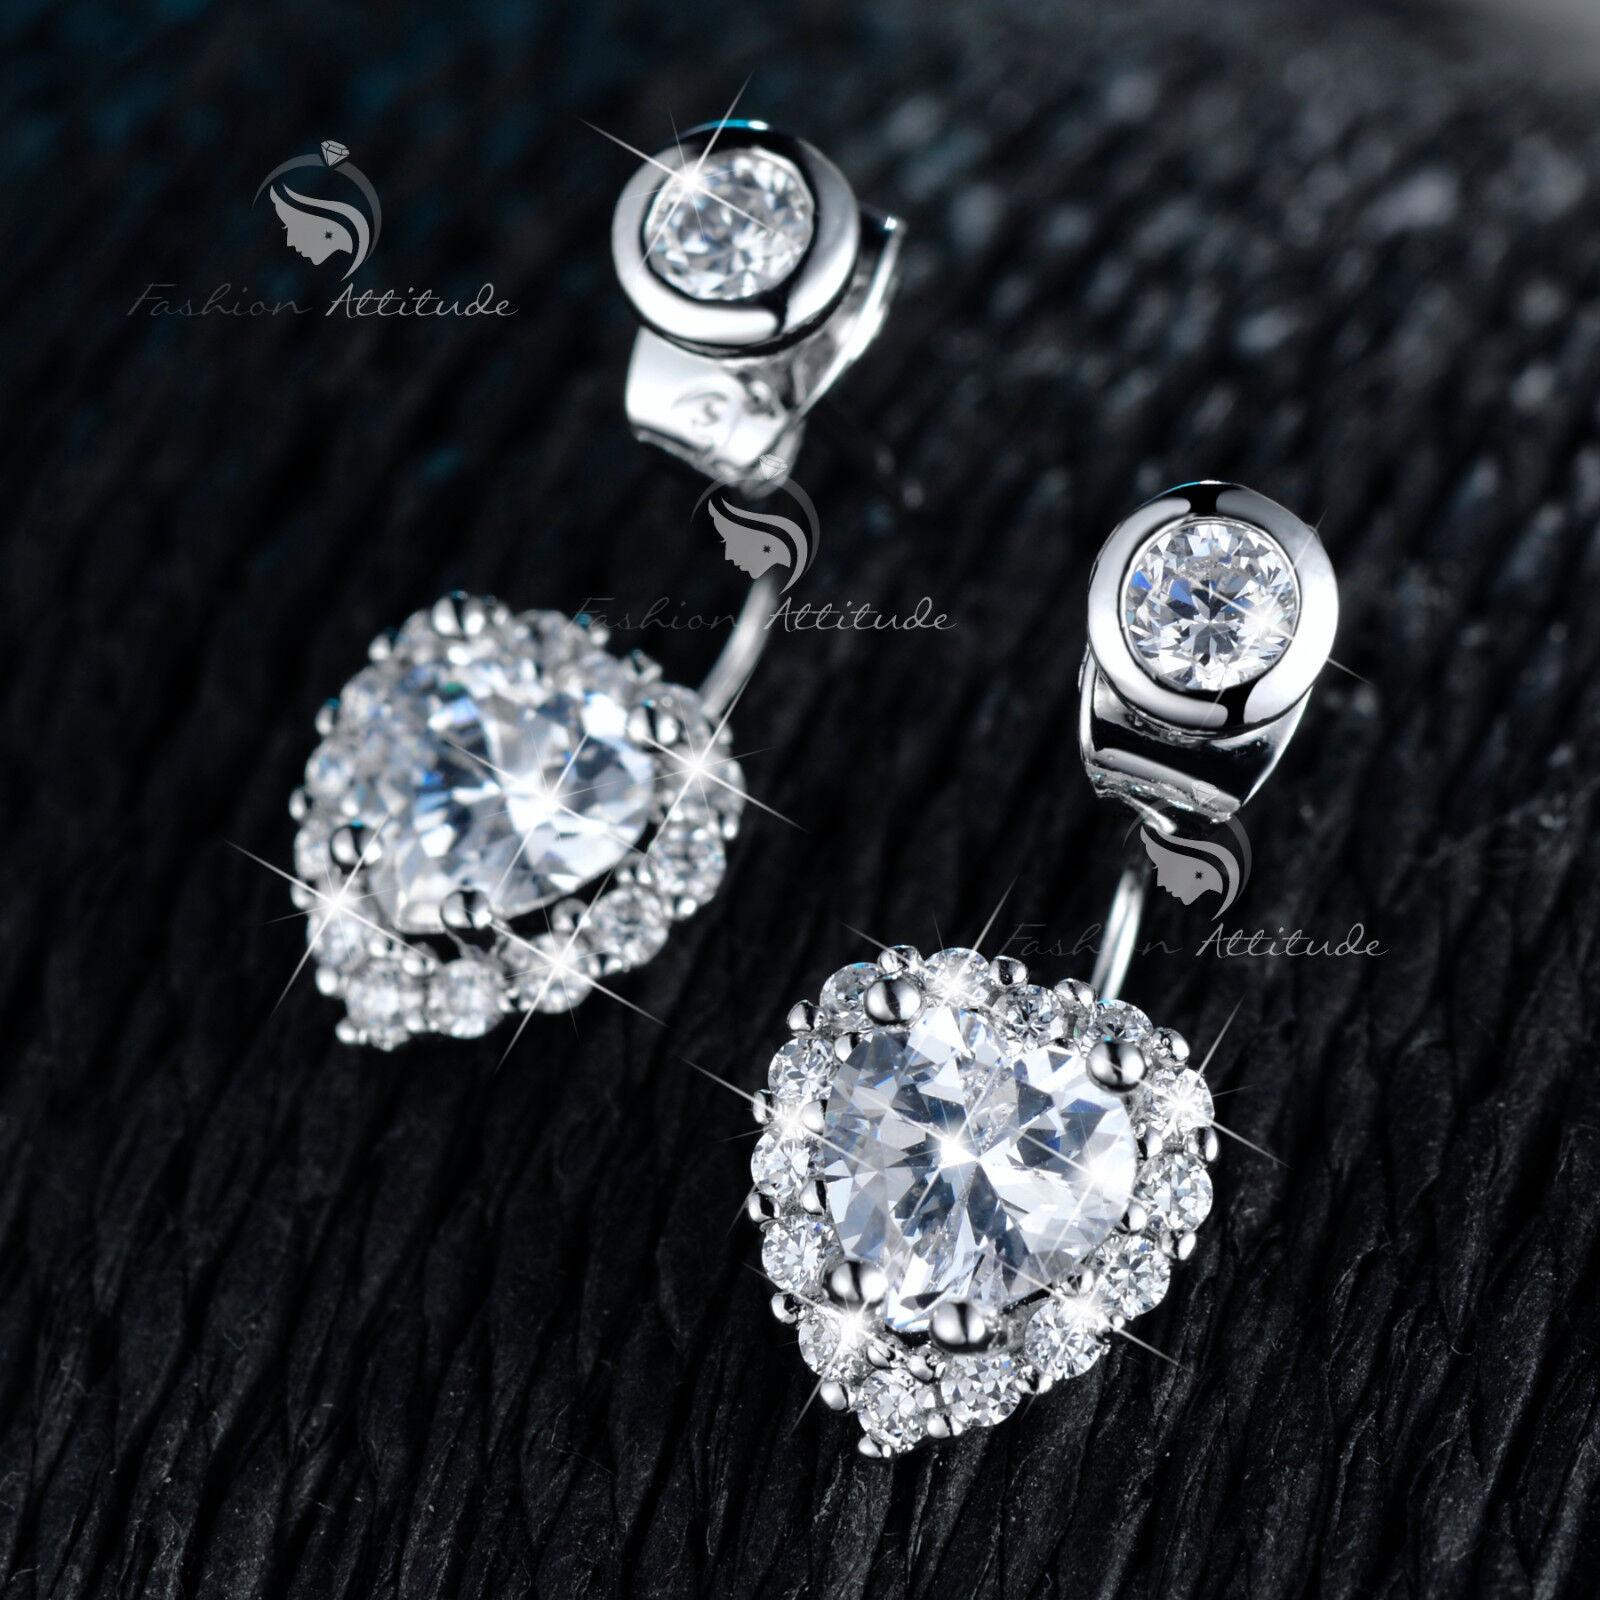 18k white gold gf made with SWAROVSKI crystal fashion stud earrings ear jacket